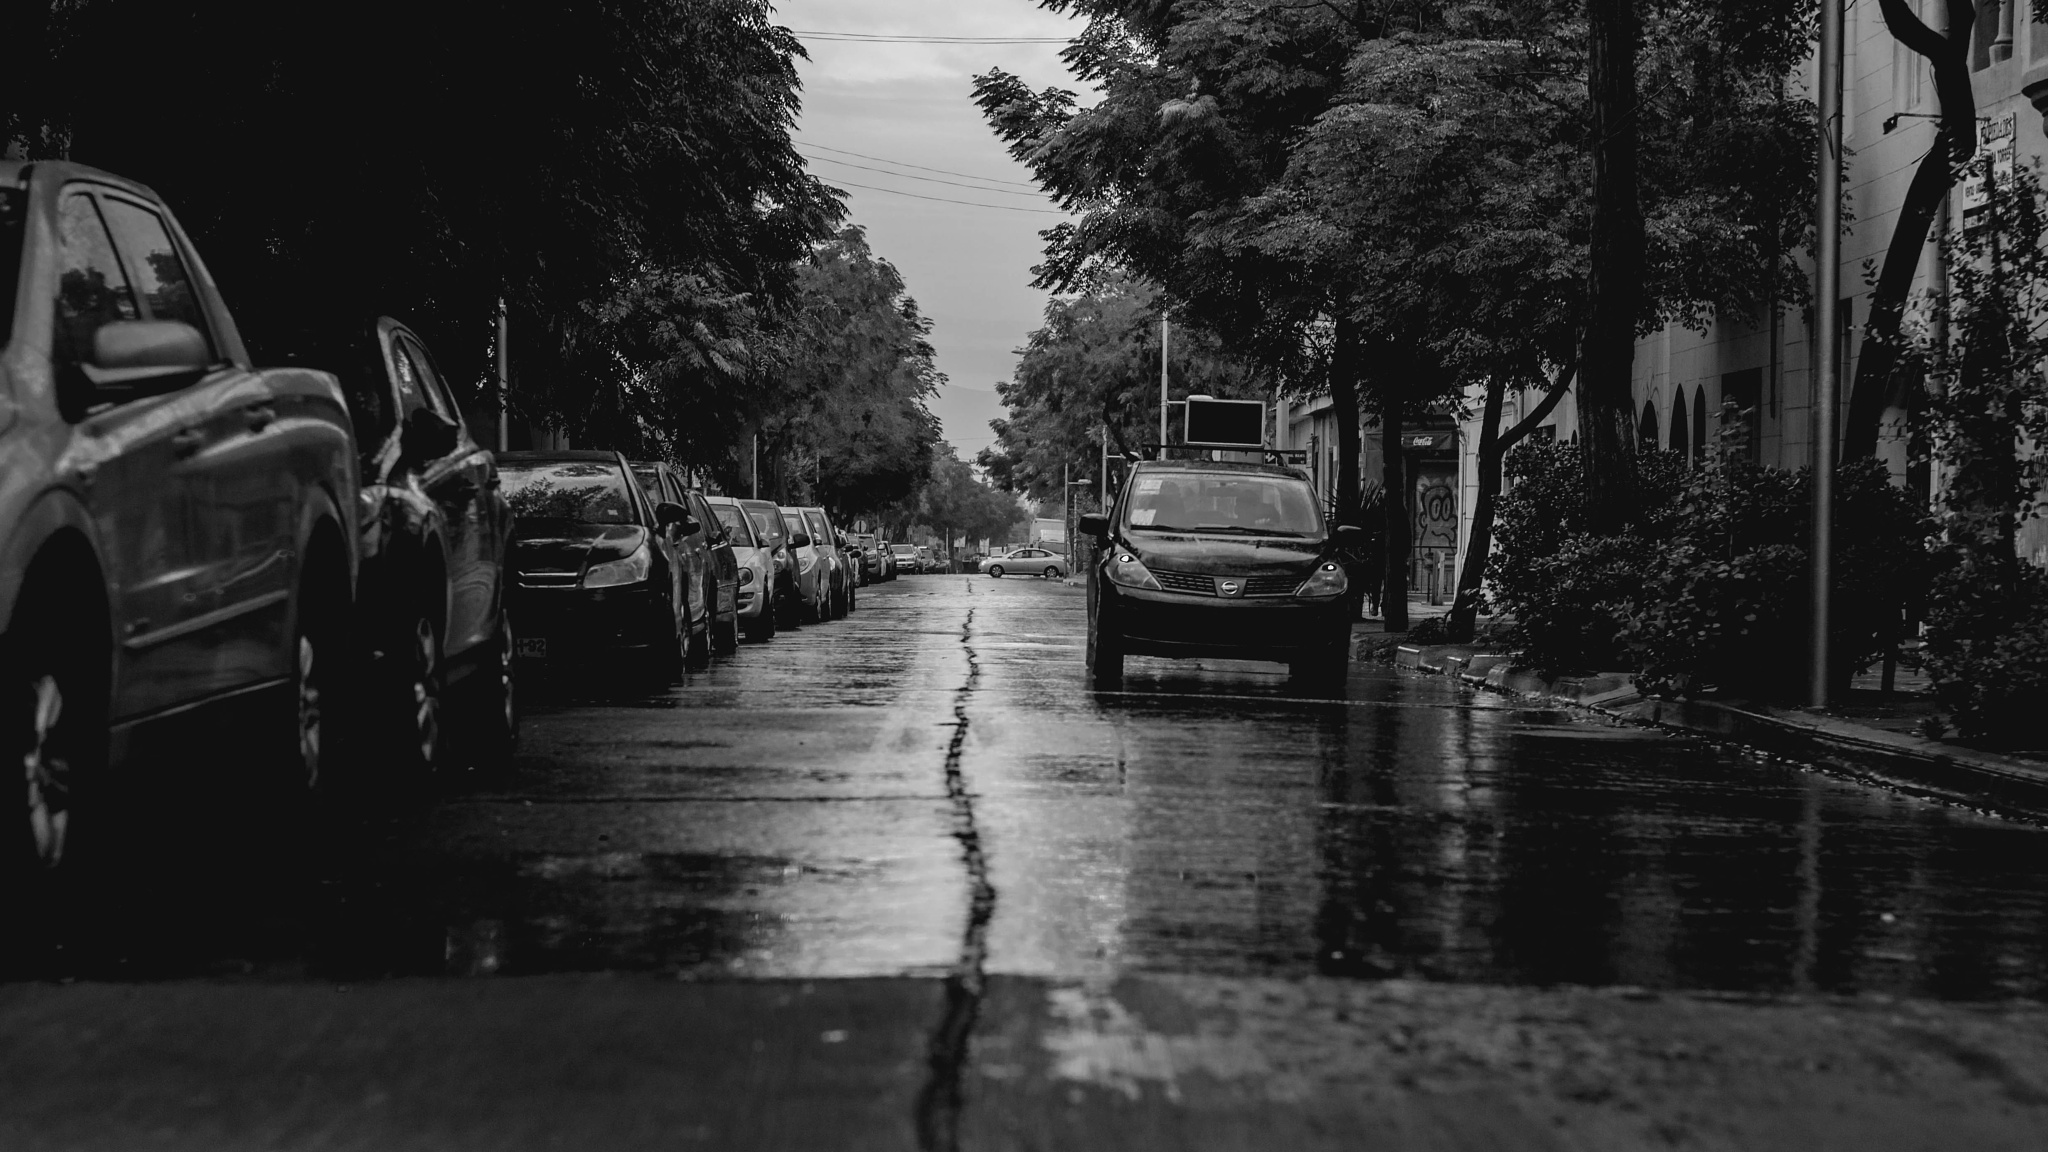 car 240616 by Eduardo Gomez